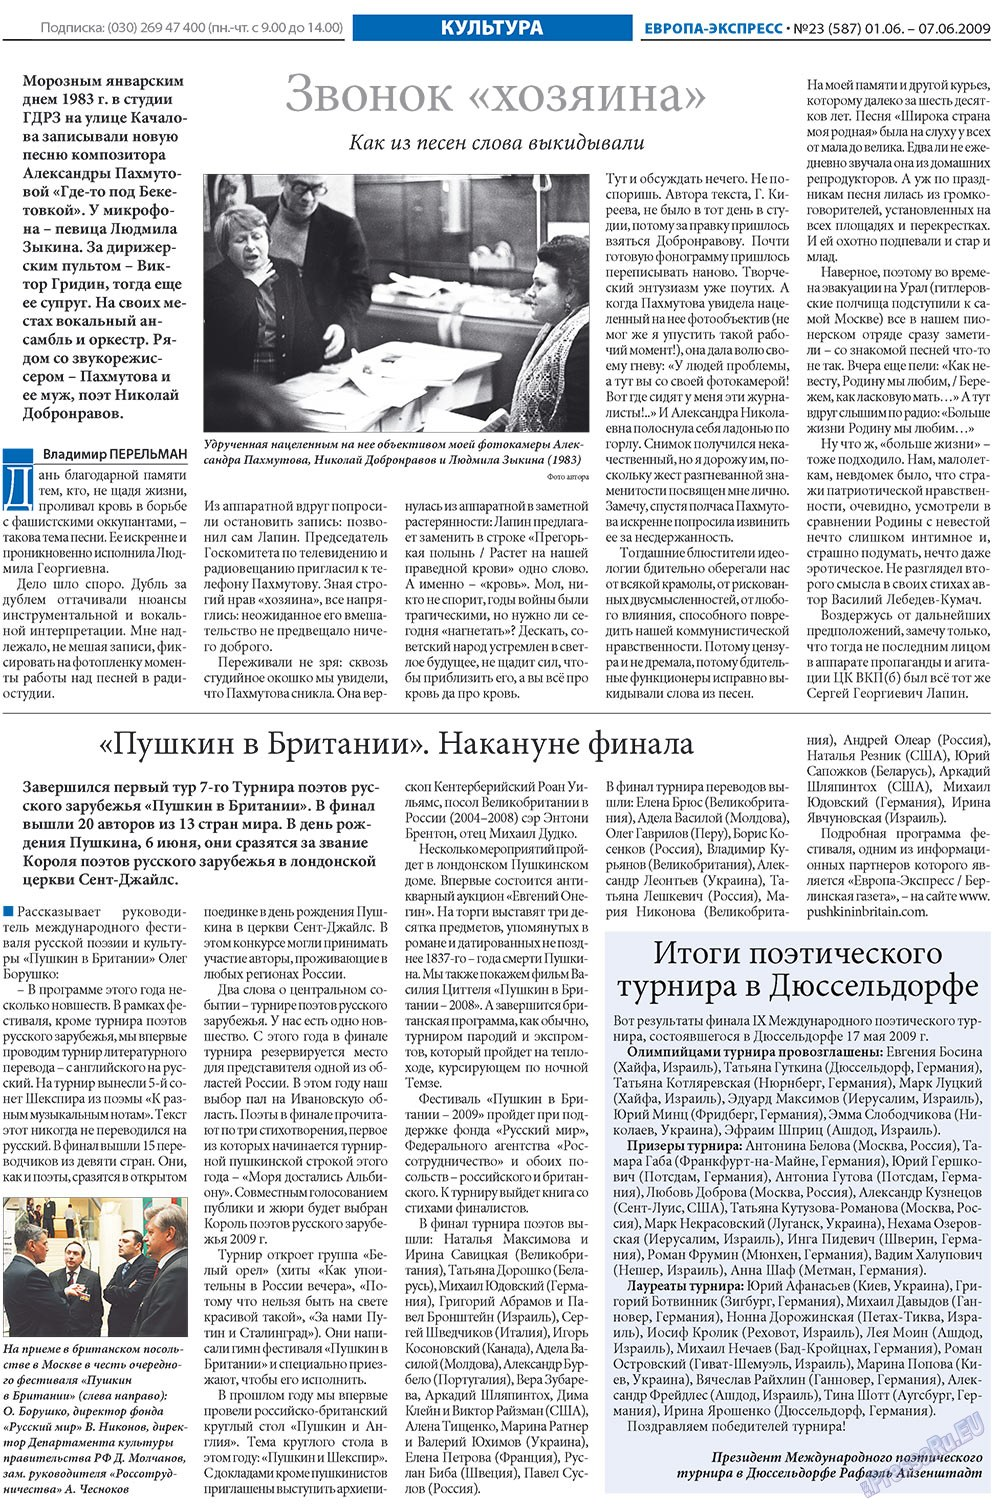 Европа экспресс (газета). 2009 год, номер 23, стр. 18